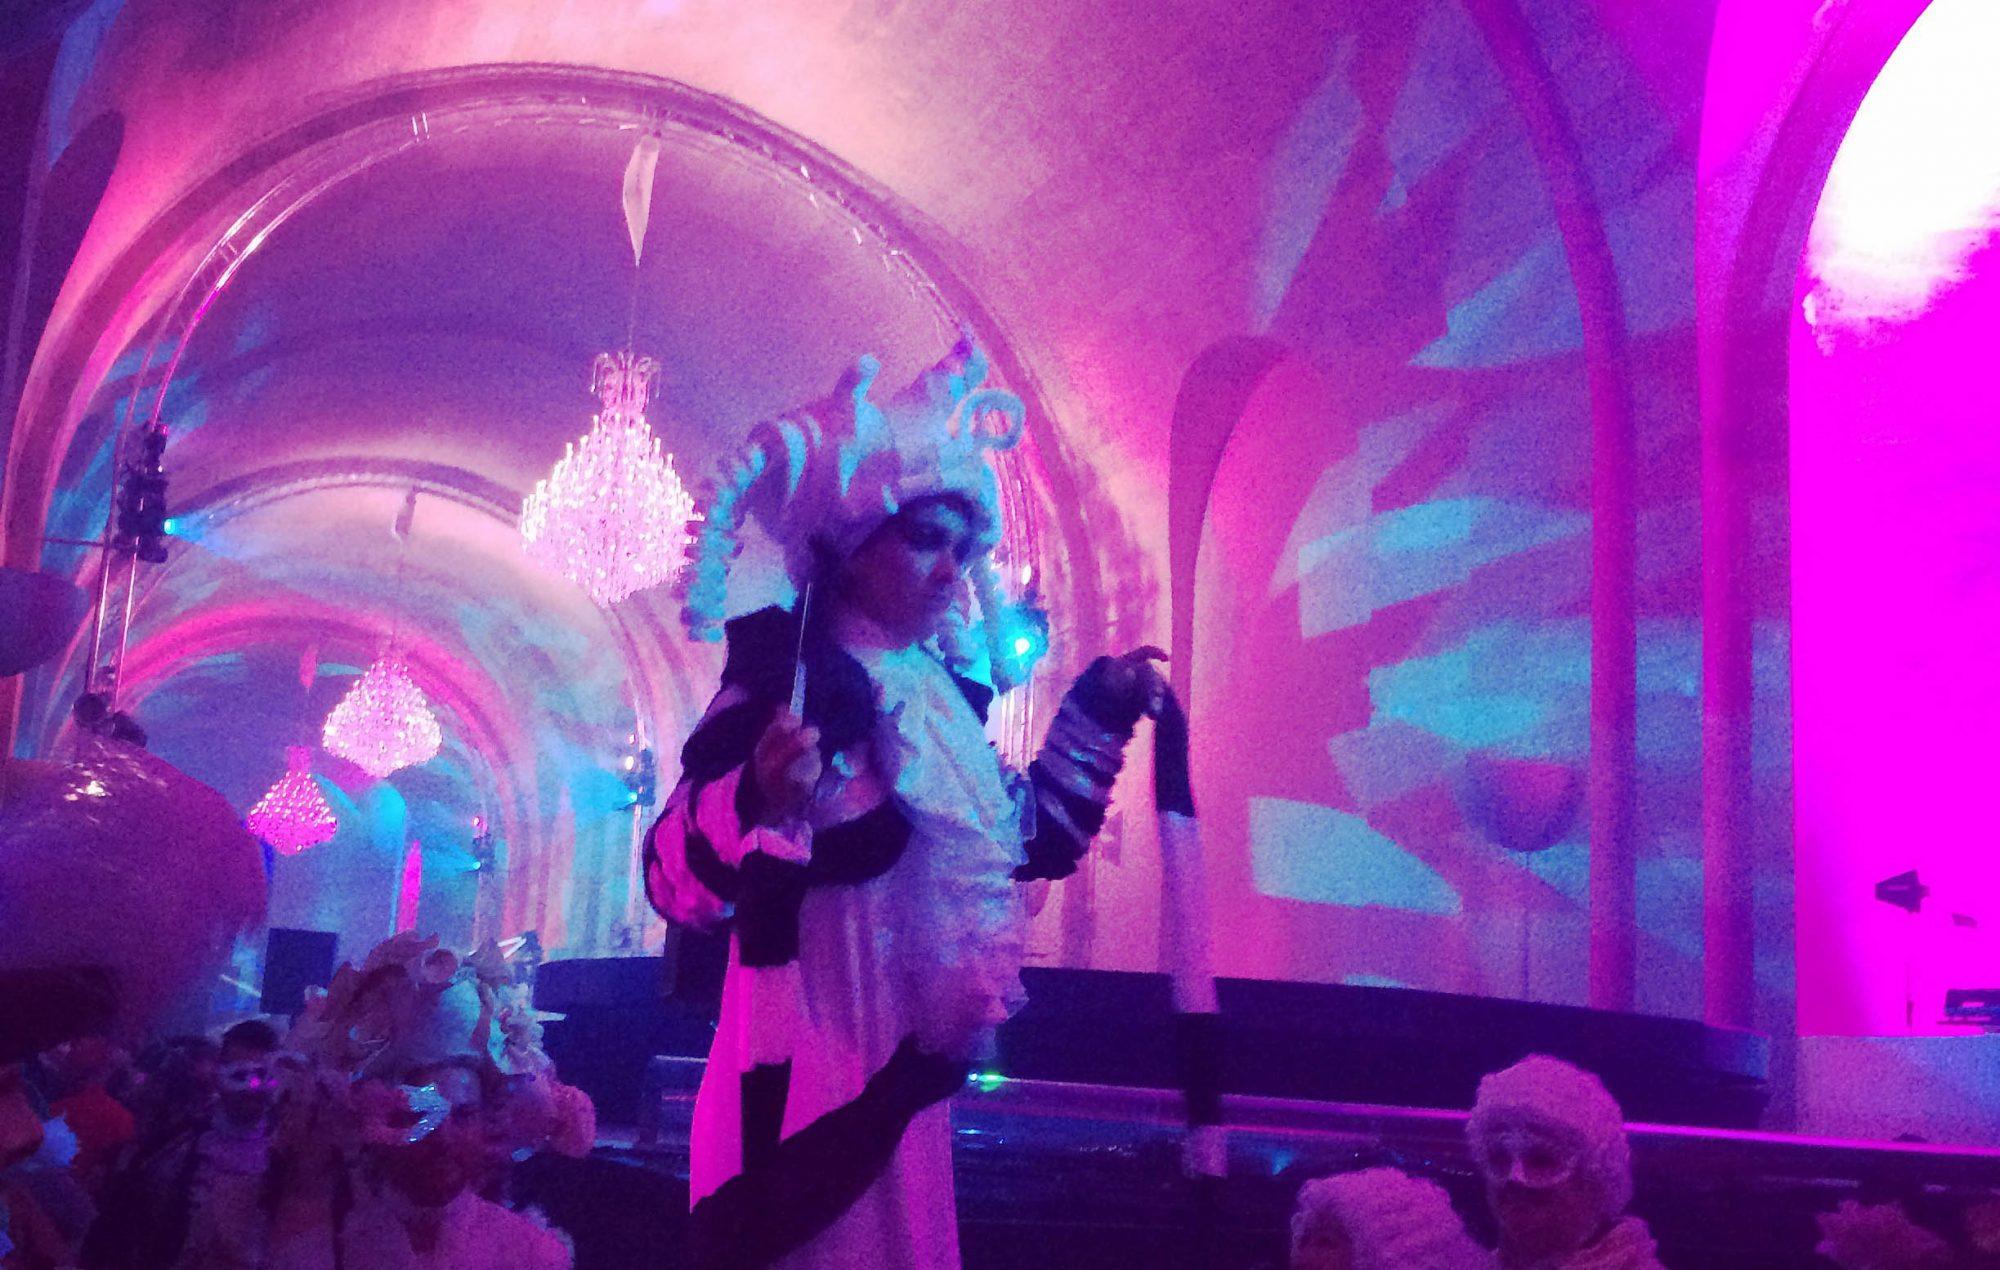 grand bal masque de versailles kamel ouali 2016 orangerie costume perruque papier Asya Kozina echasses